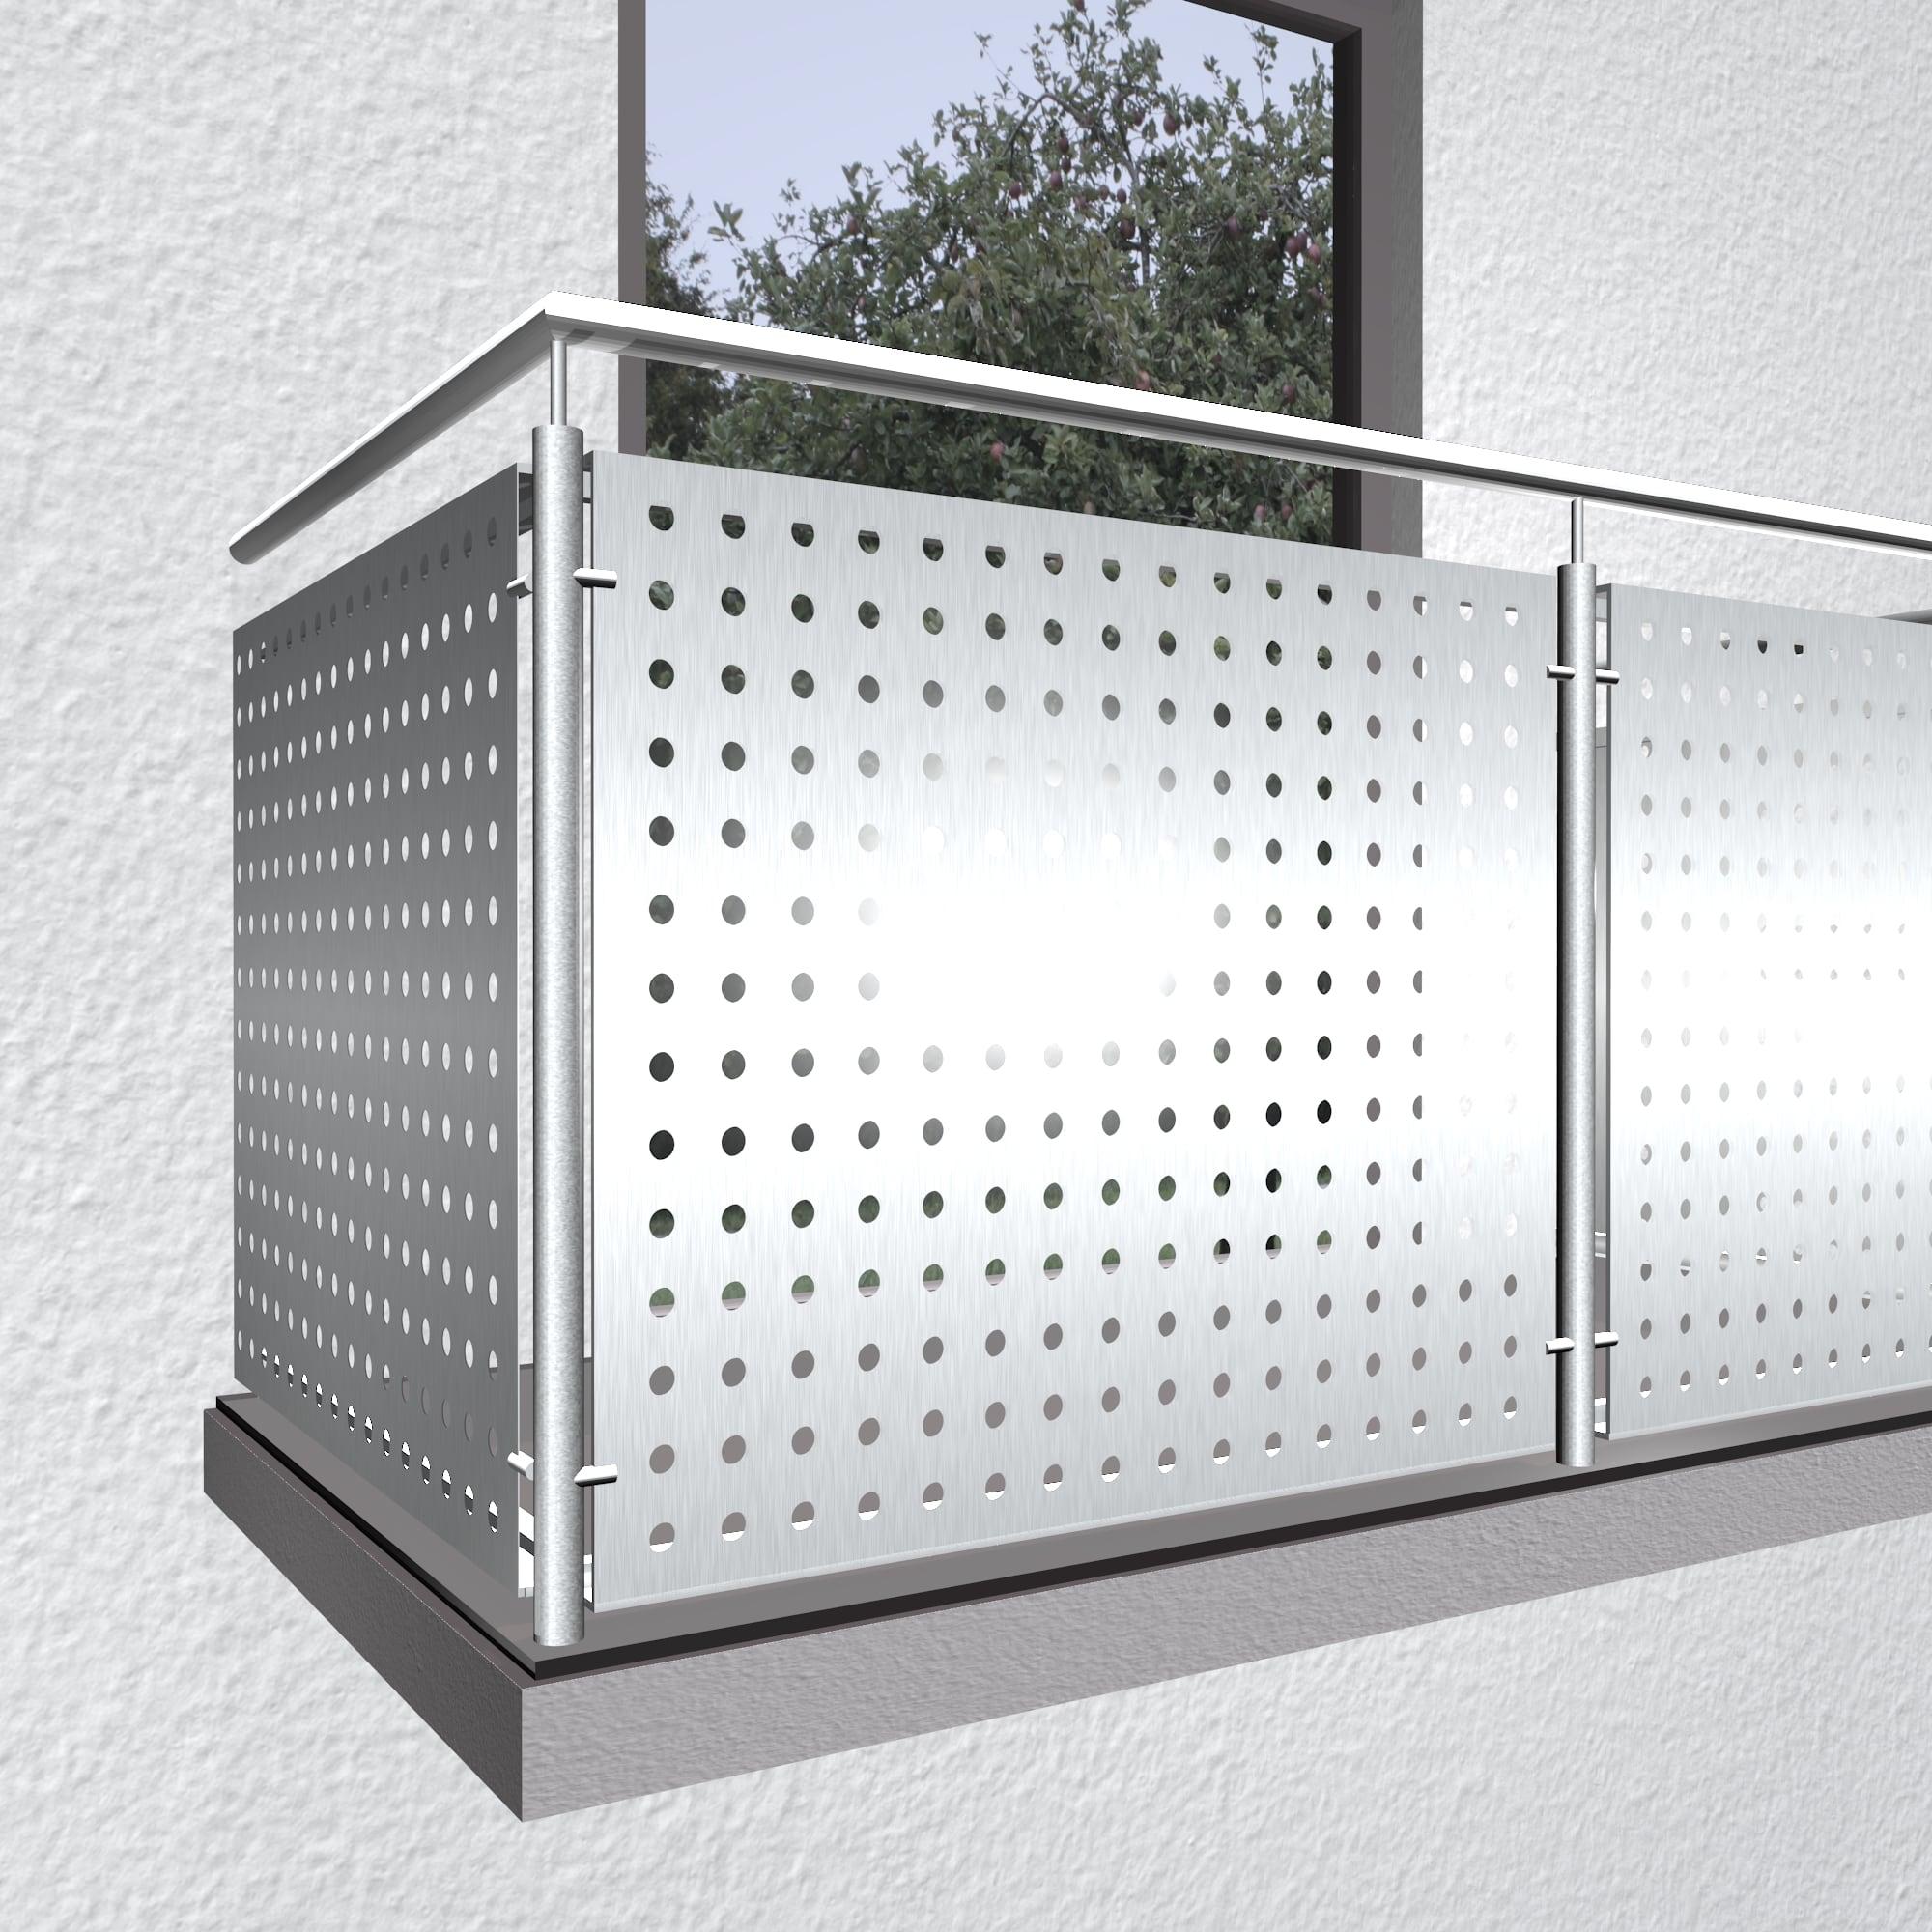 Balkonverkleidung Aluminium RL GE